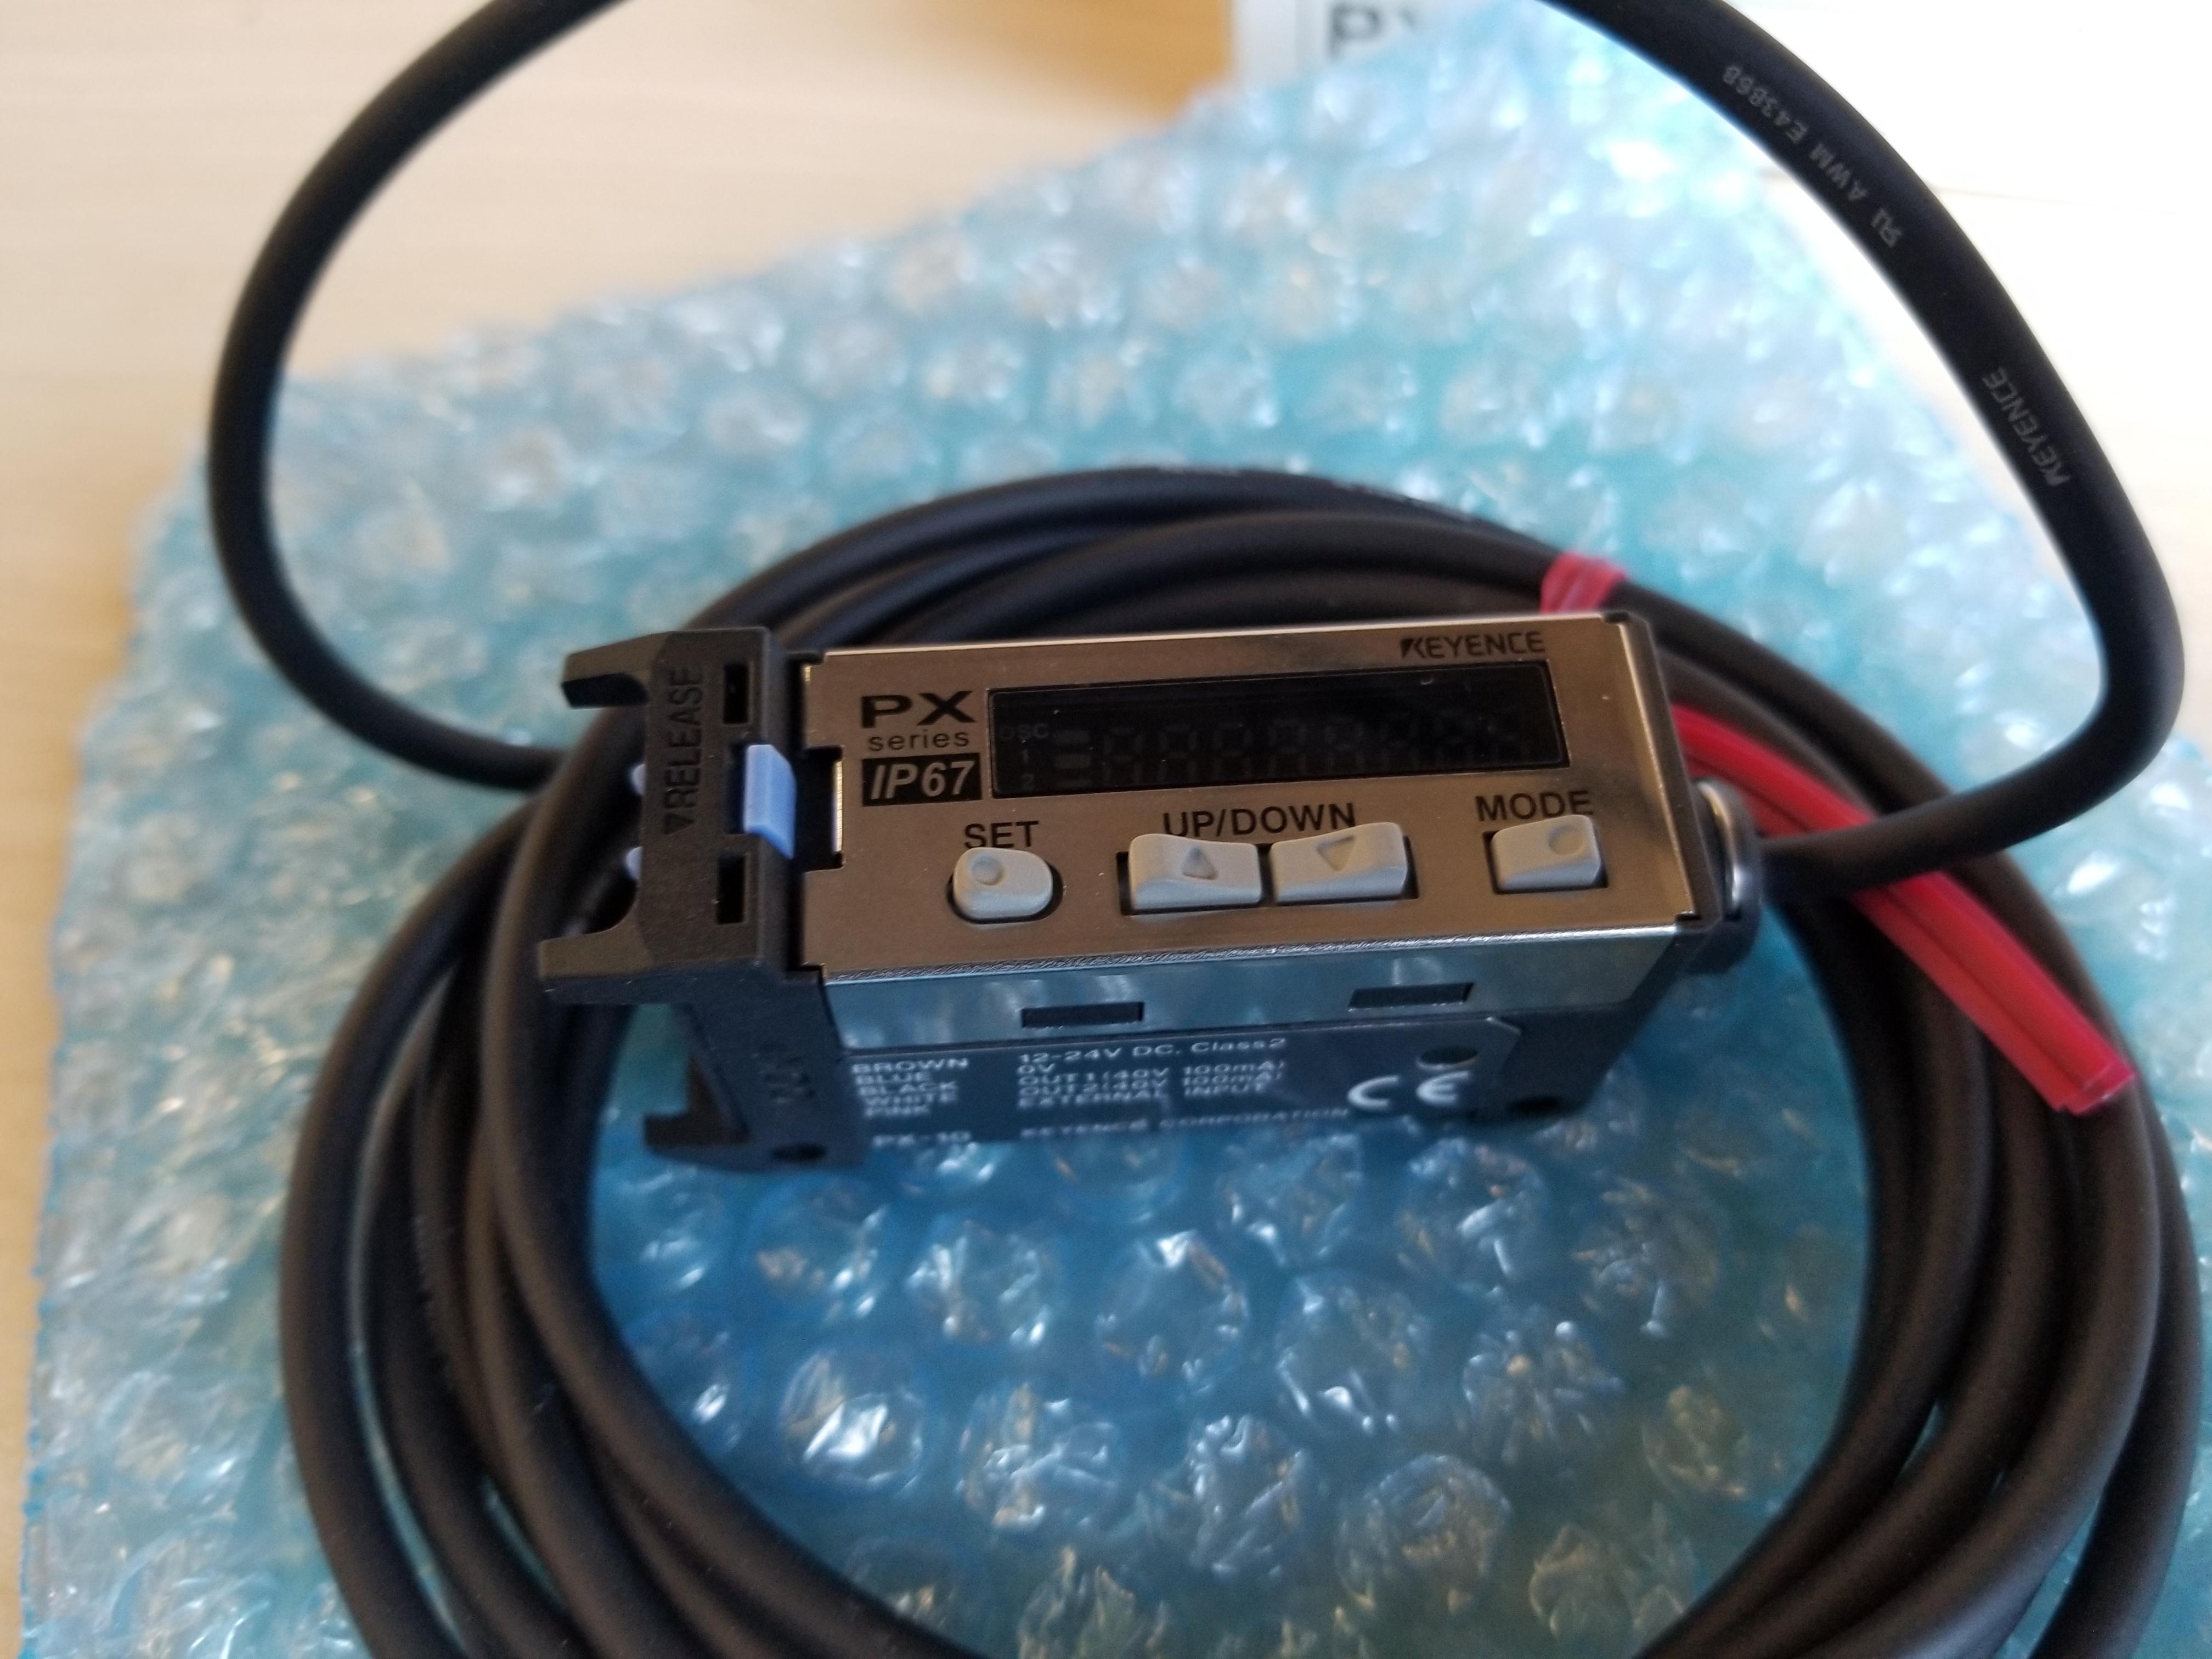 New Keyence Environment Resistant Digital Photoelectric Sensor PX-10 - Image 2 of 5